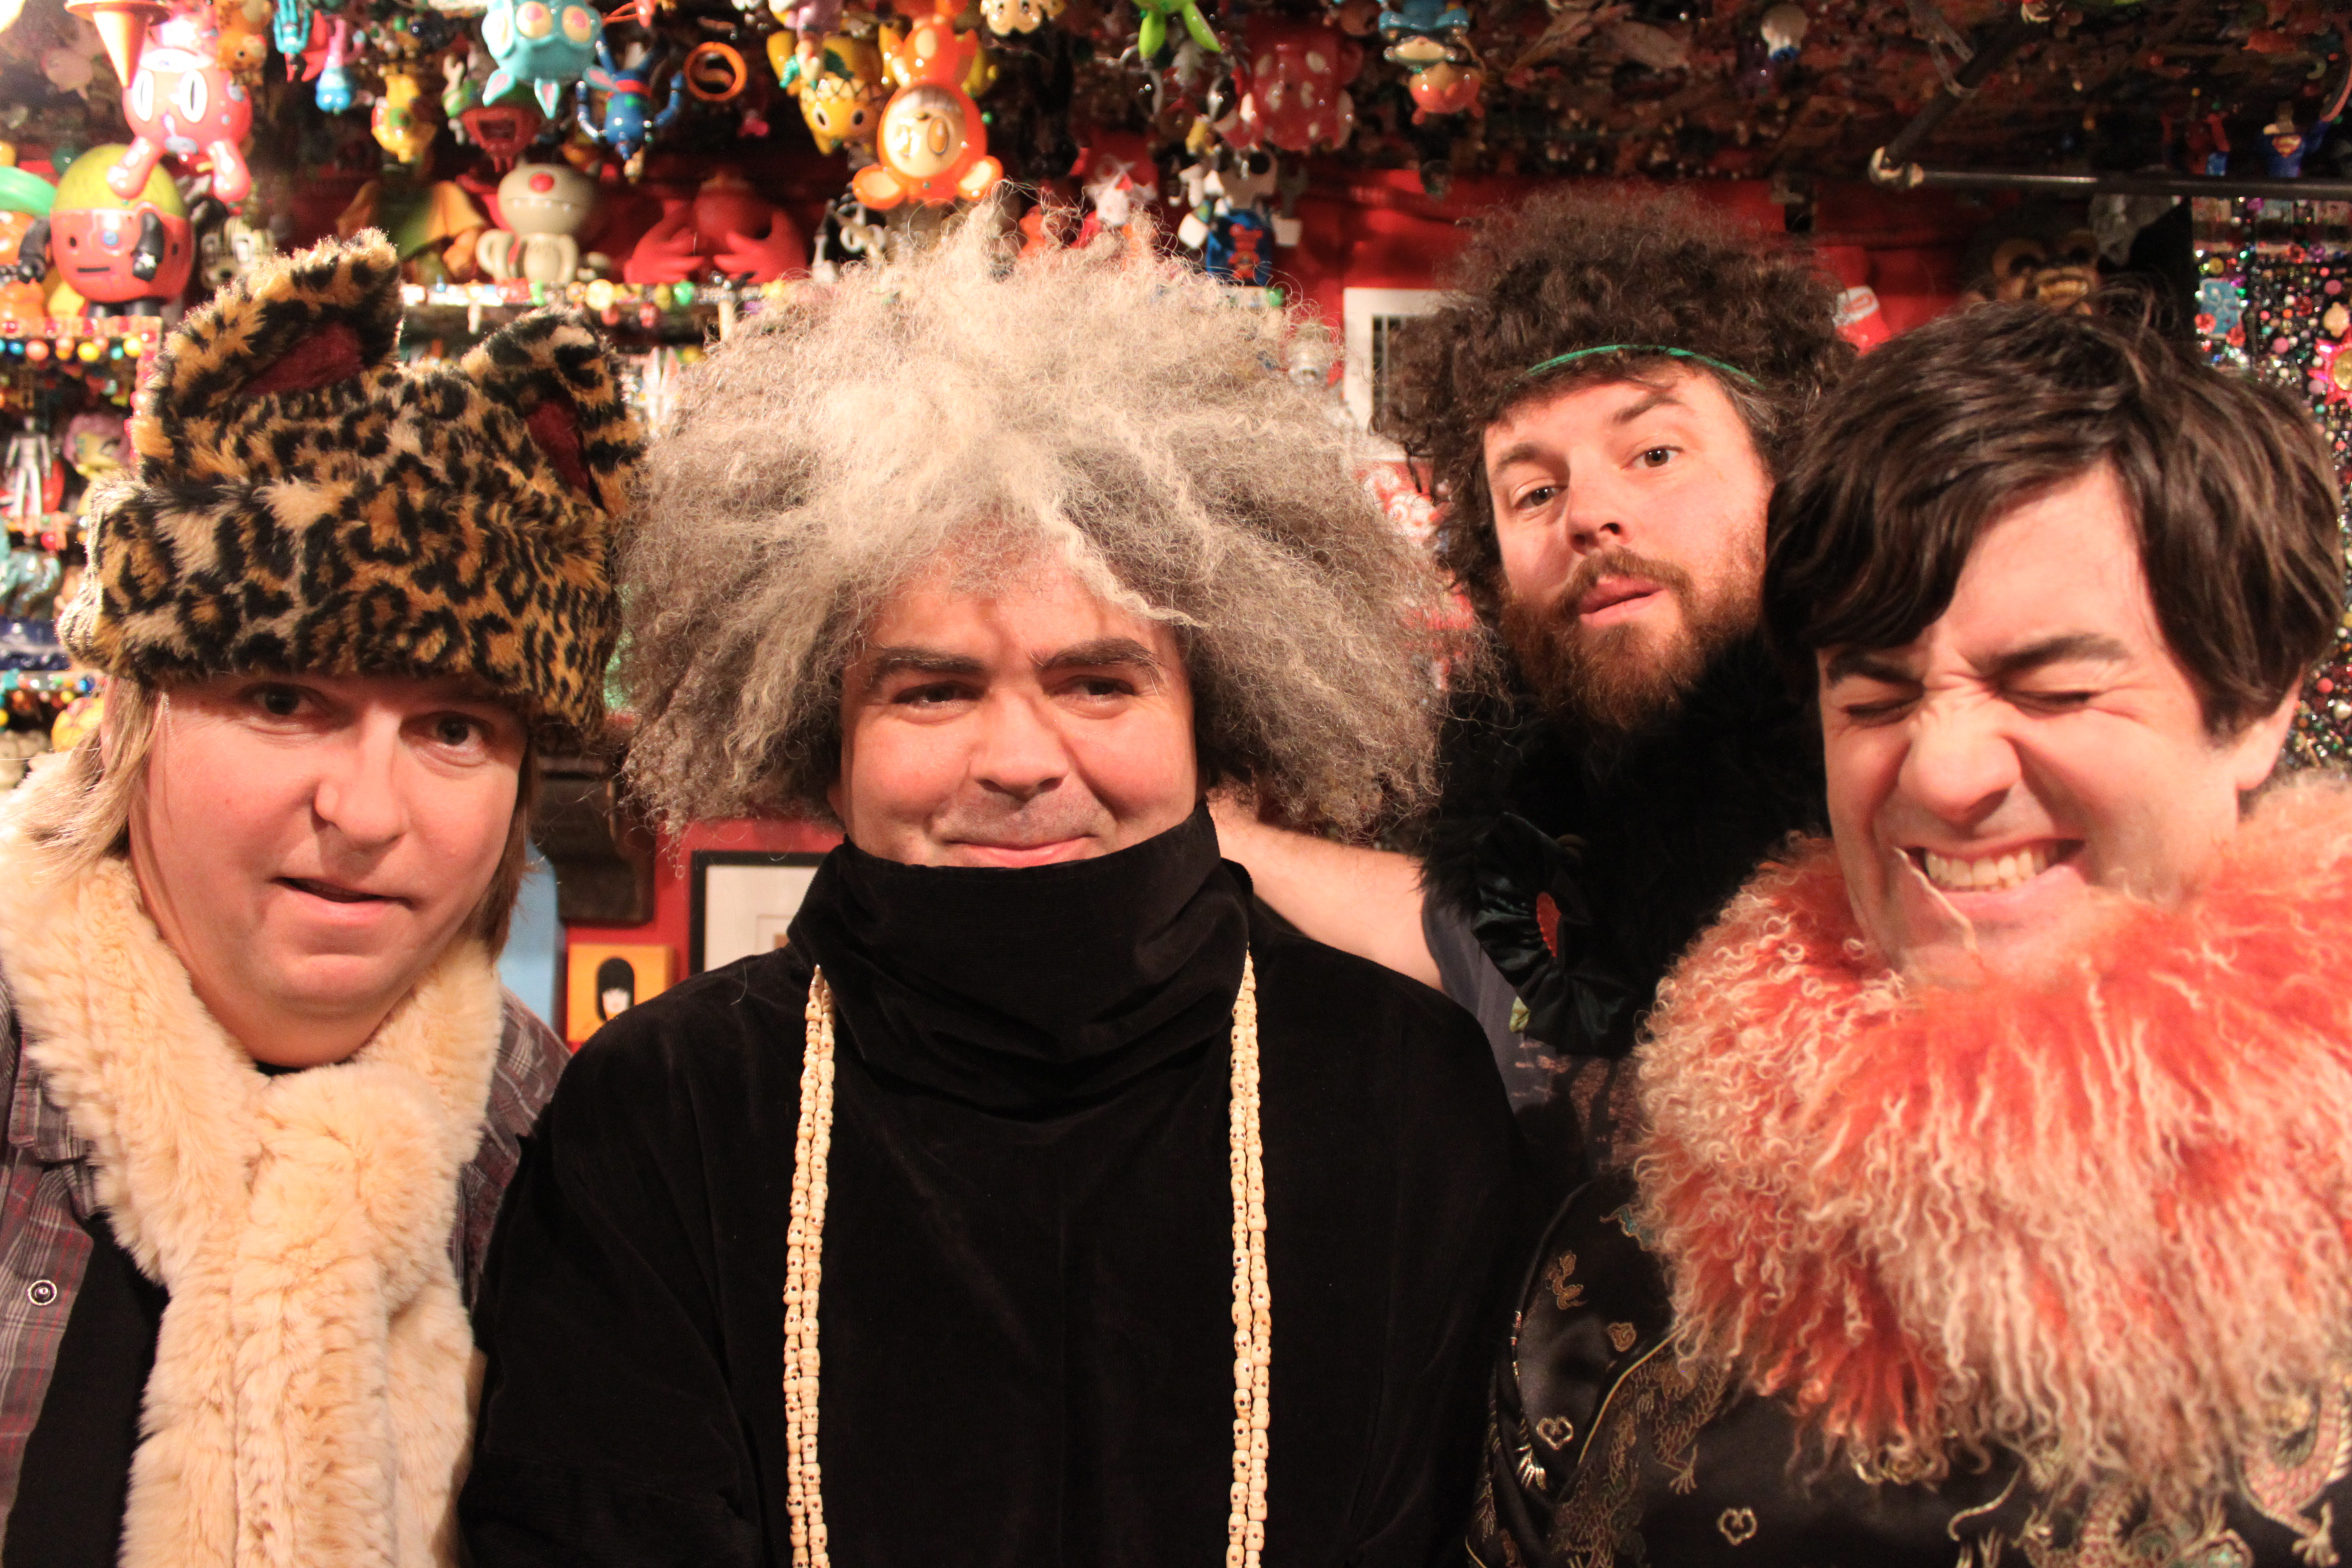 Melvins Melvins